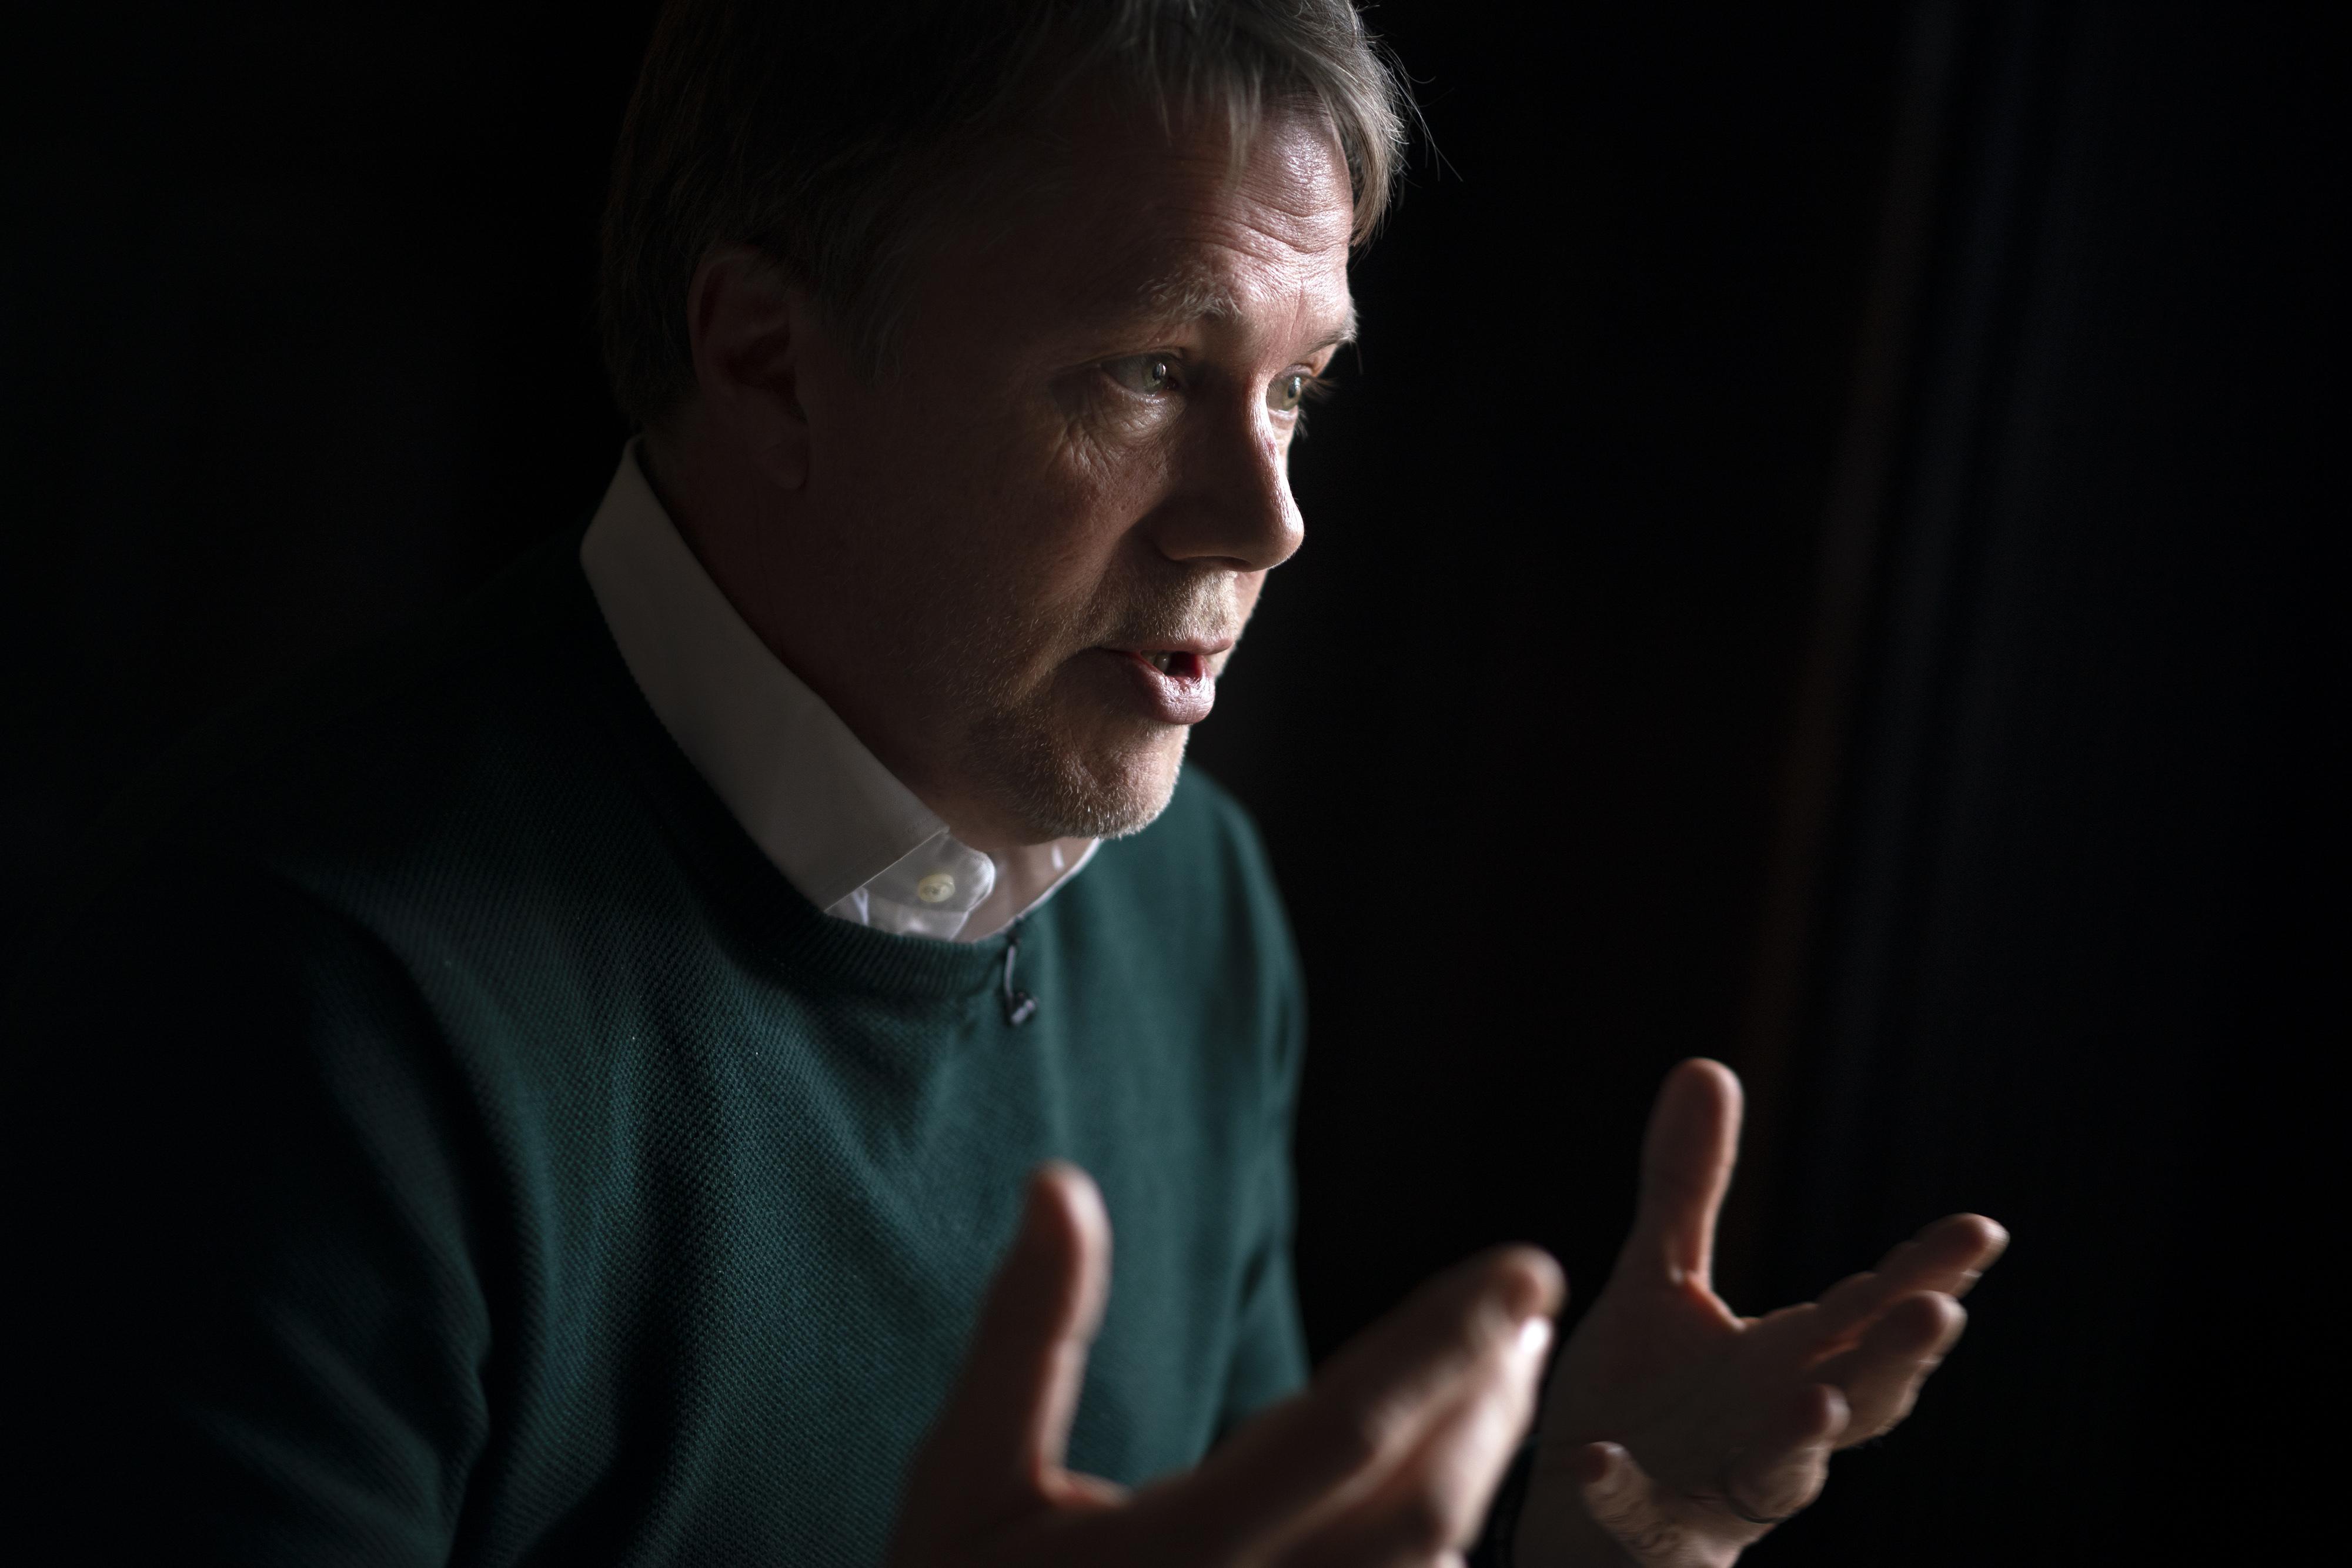 Netflix show returns late Argentine prosecutor to spotlight